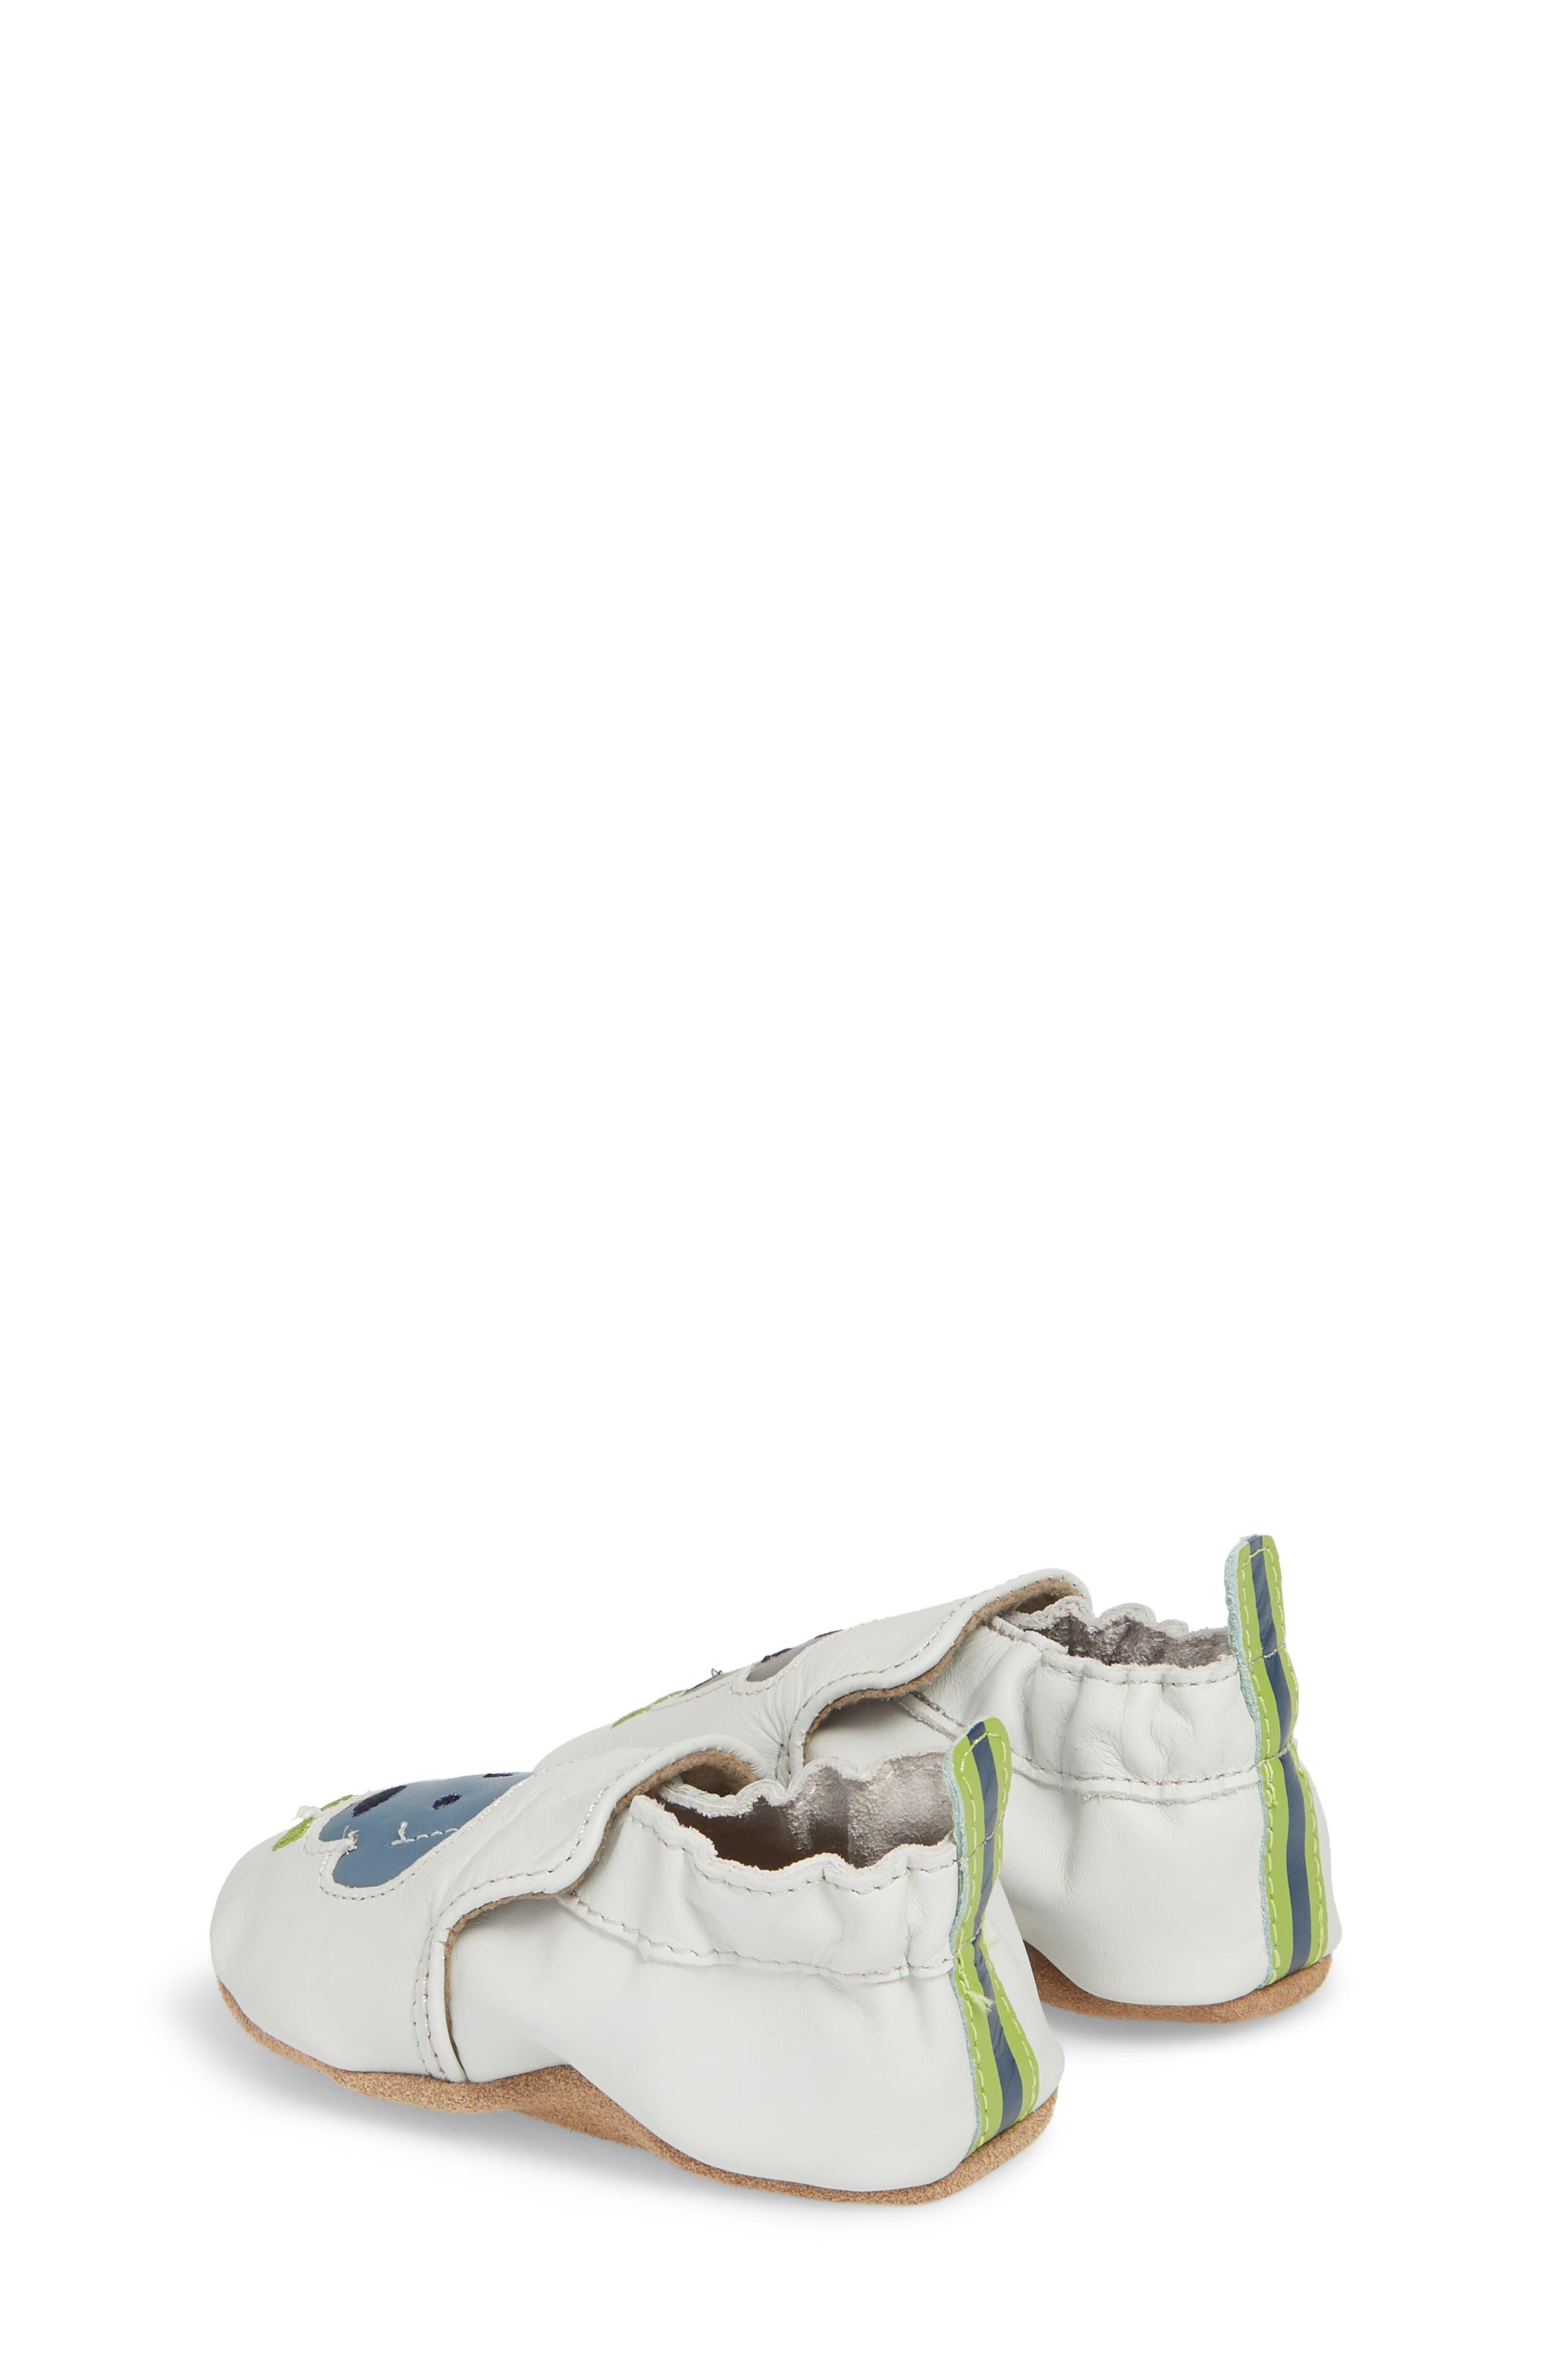 Dog Buddies Moccasin Crib Shoe,                             Alternate thumbnail 2, color,                             Light Grey